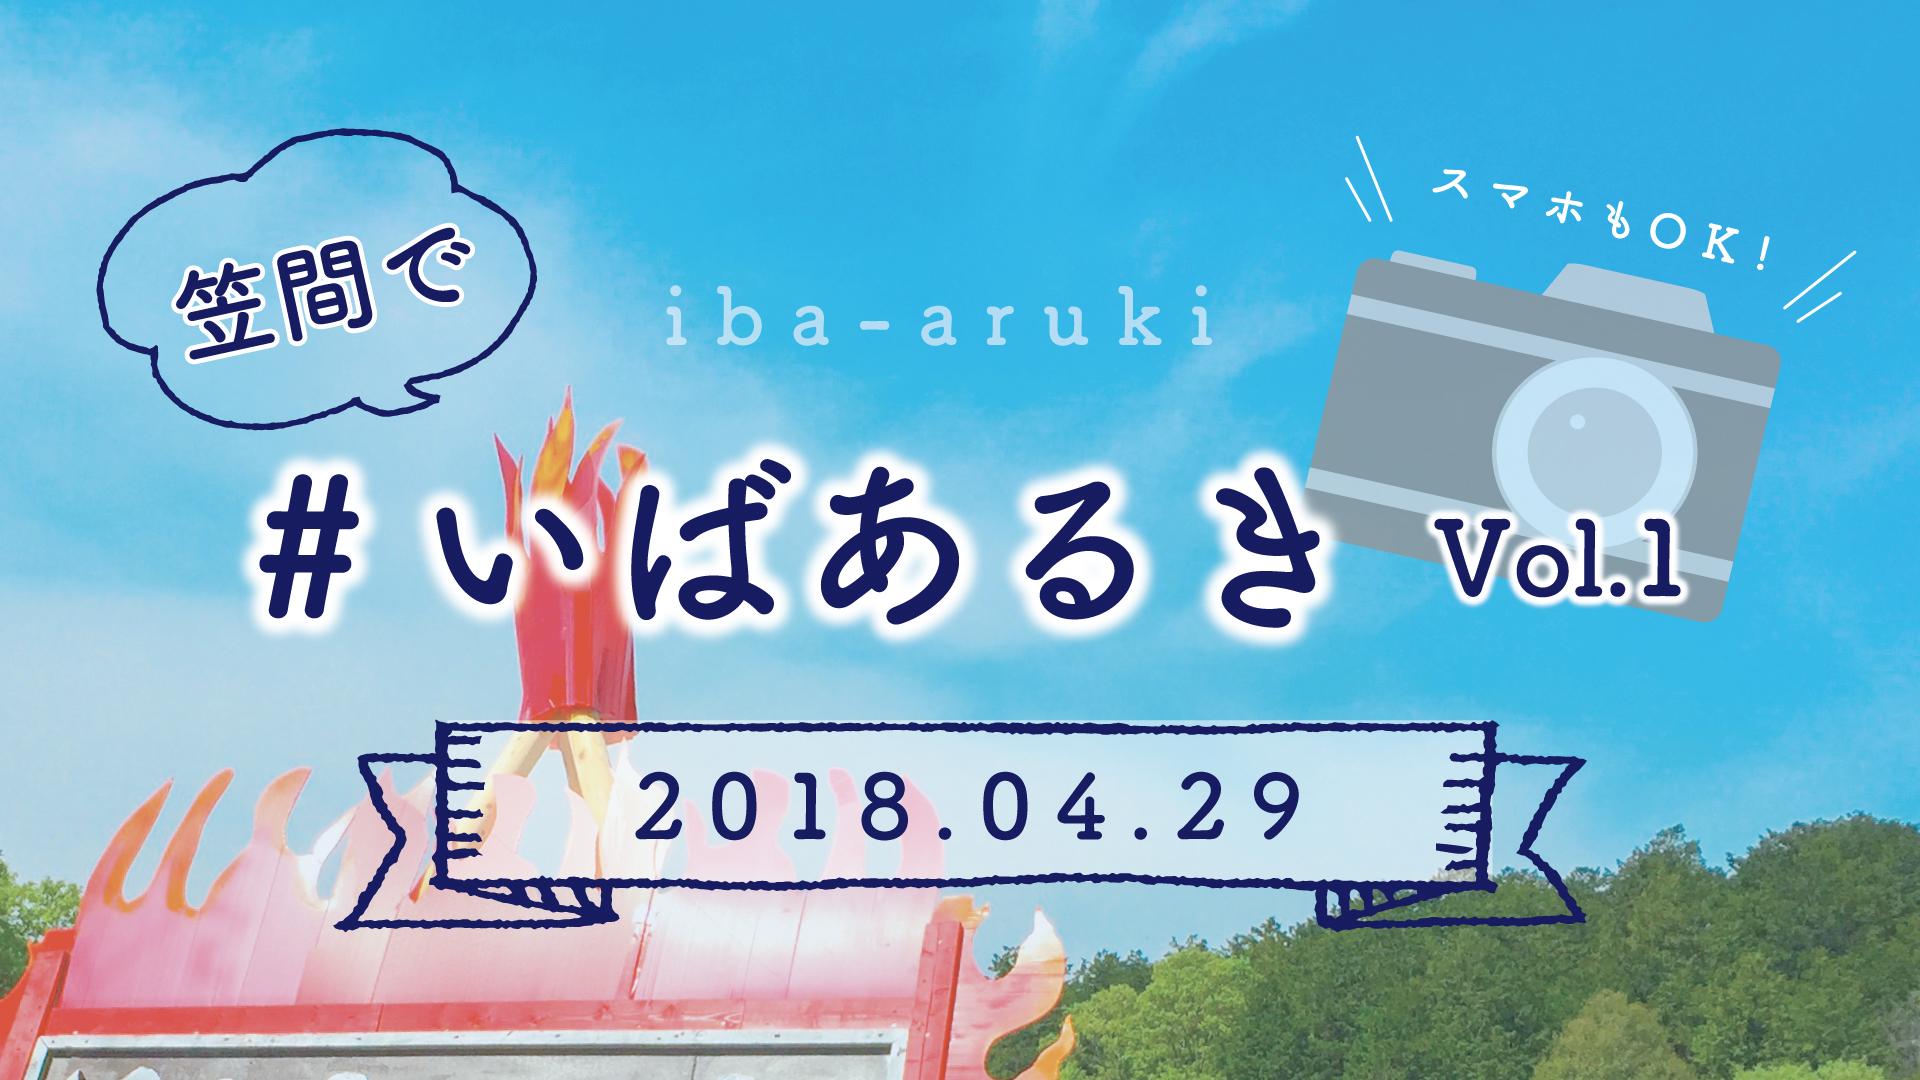 ibaaruki-vol1